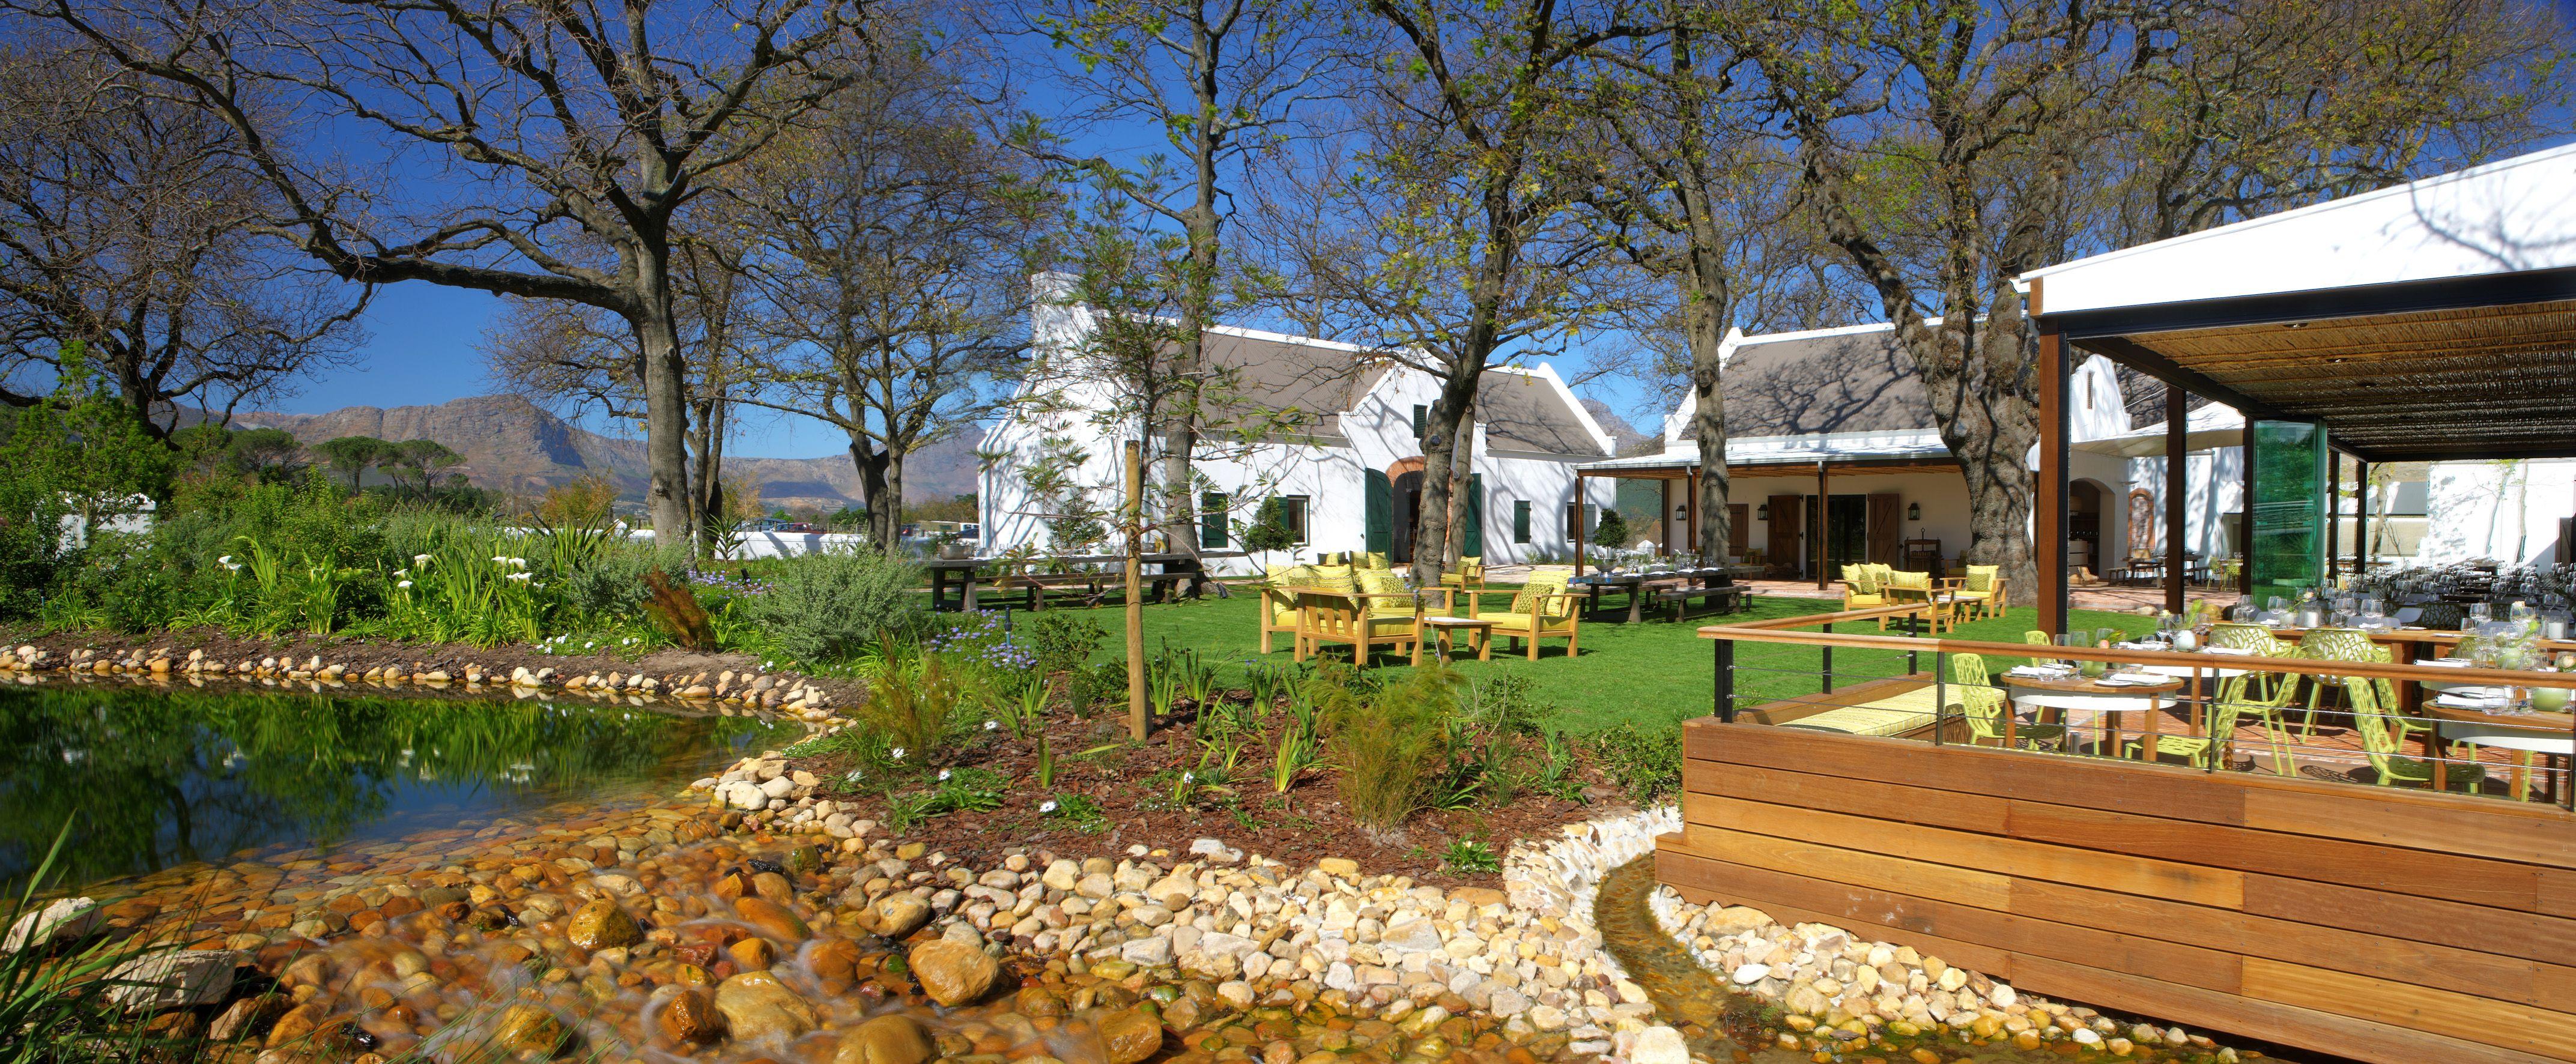 La Motte Courtyard And Pond Lamotte Courtyard Outdoors Estate House Styles Landscape Restaurant